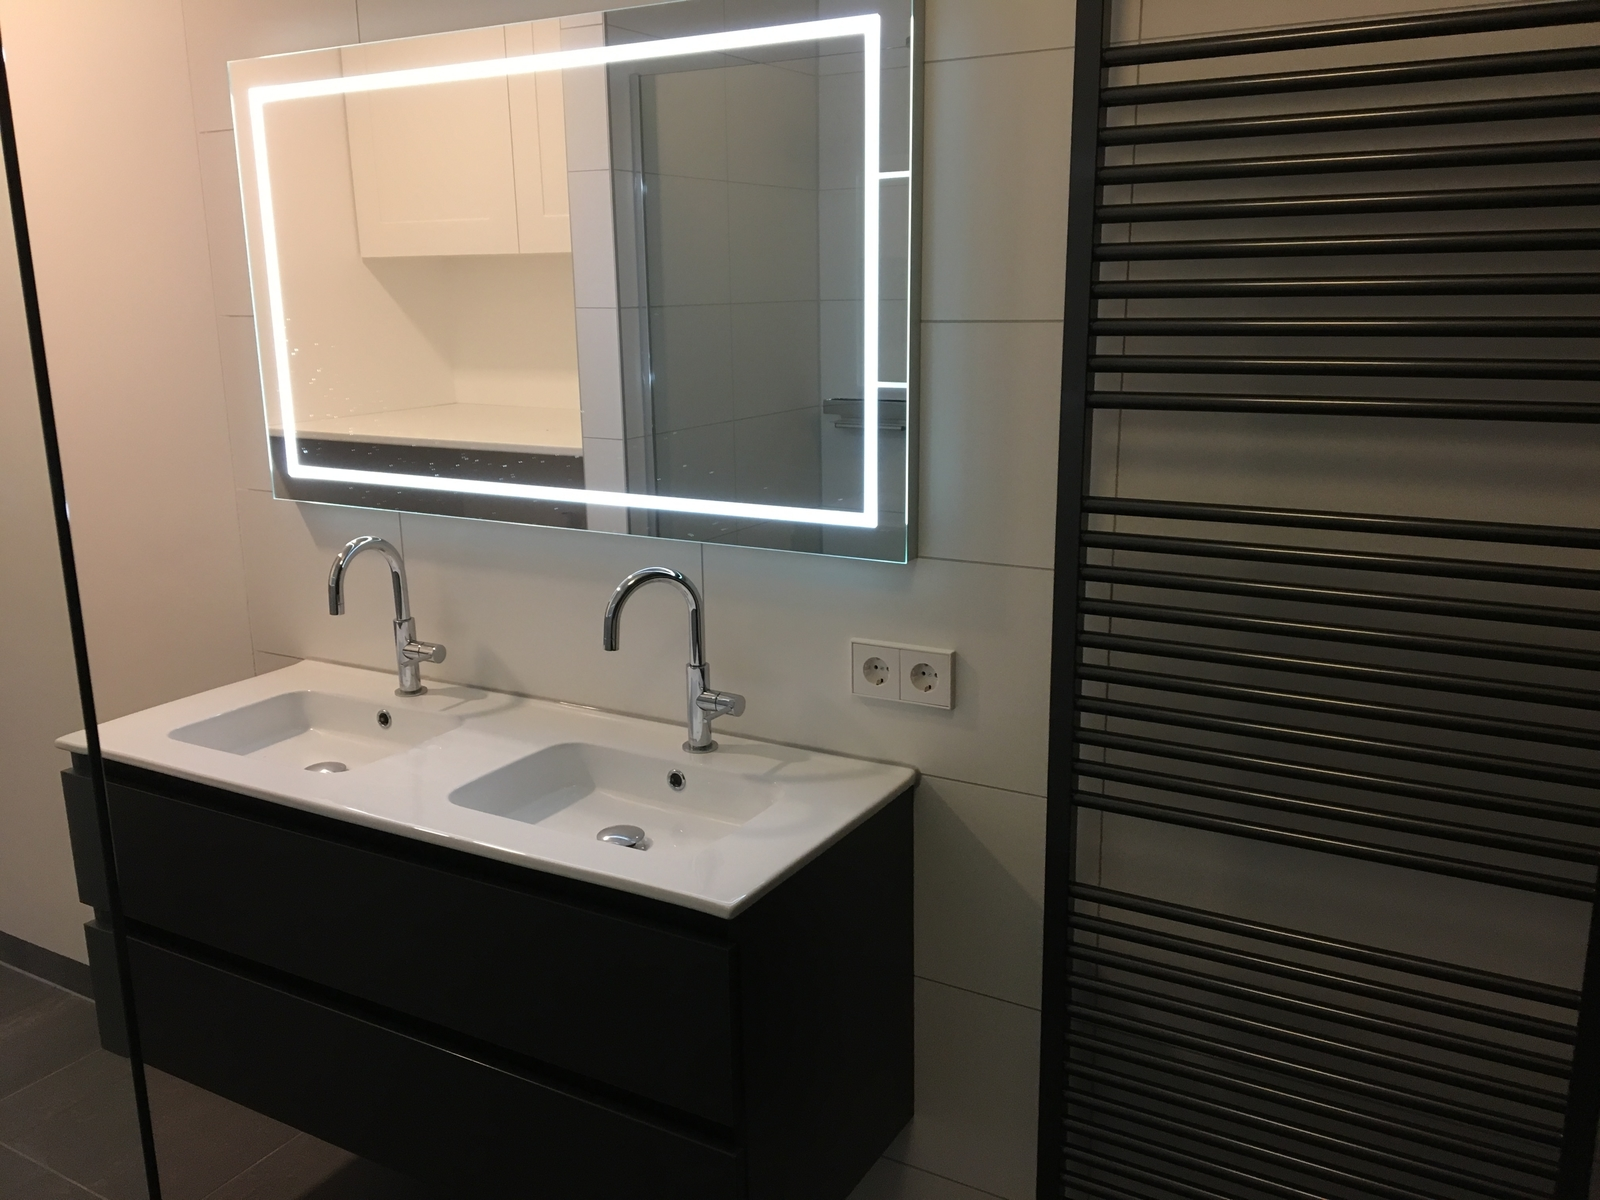 Betonlook badkamer toilet amsterdam tuijps tegels sanitair en